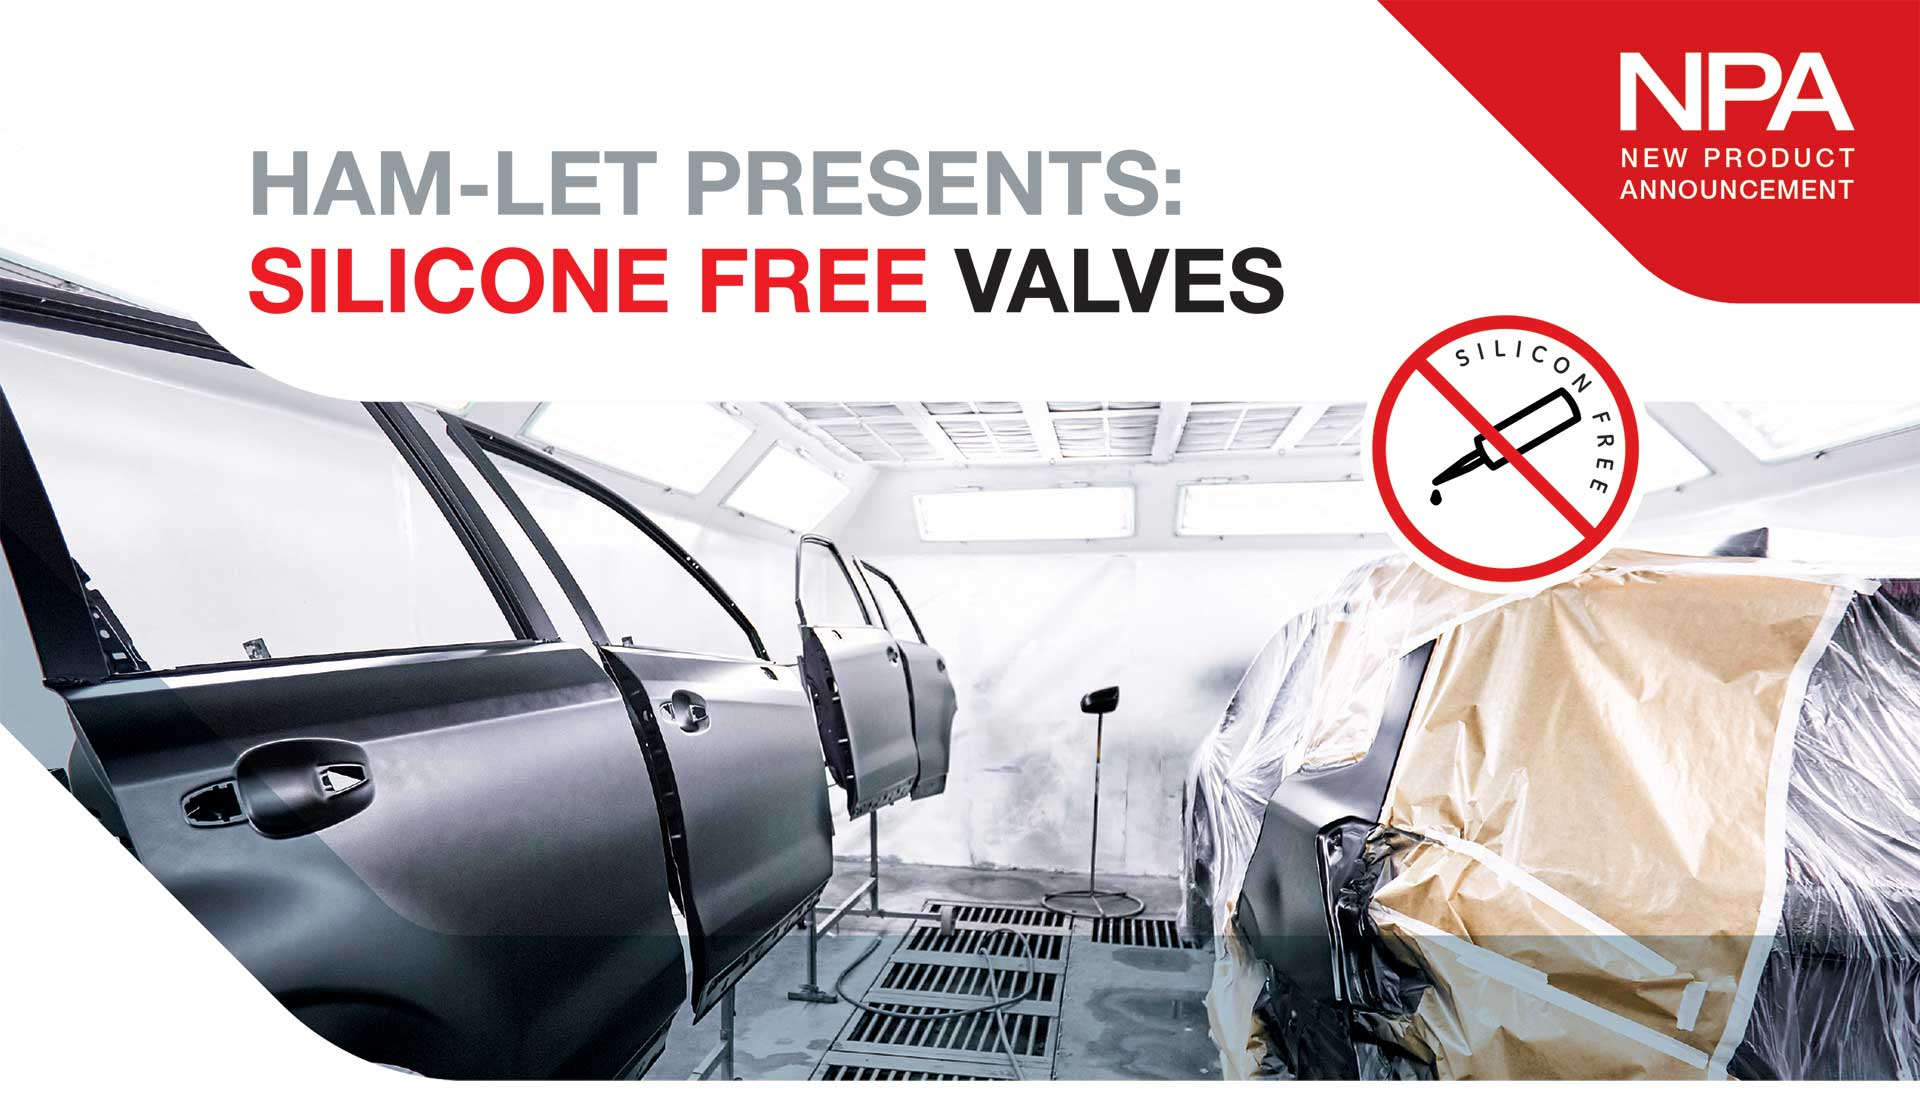 Silicone Free Valves HAM-LET Swagelok